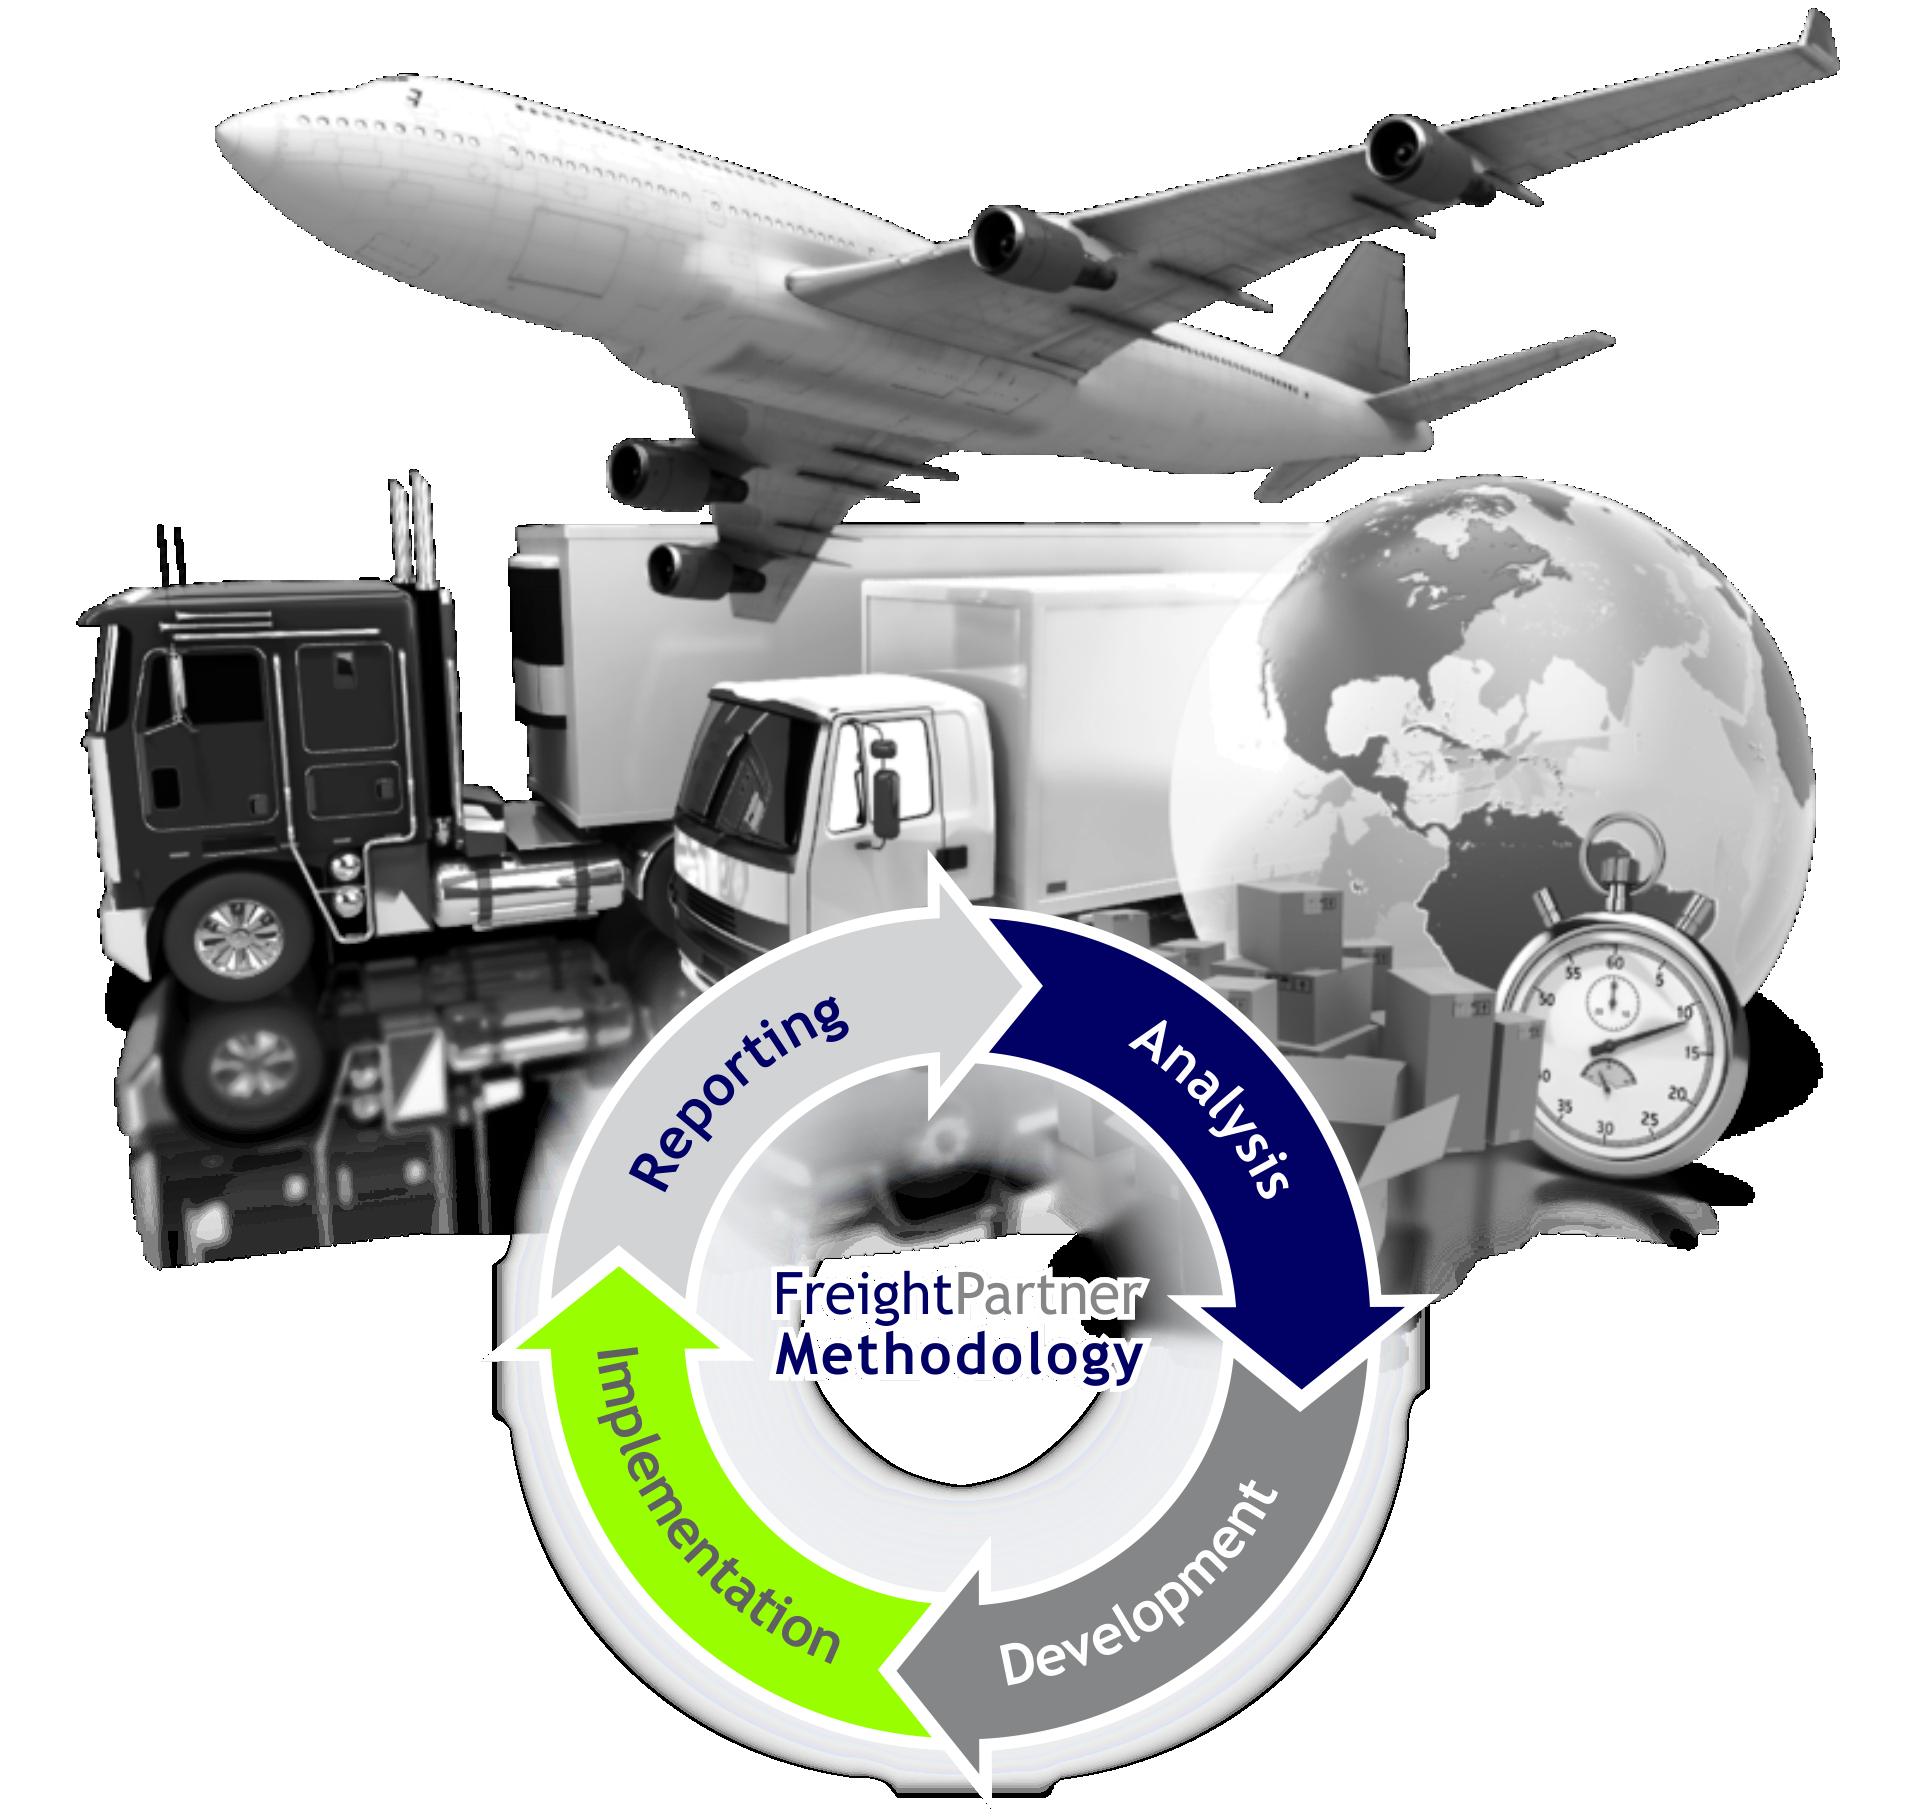 FreightPartner Approach ii